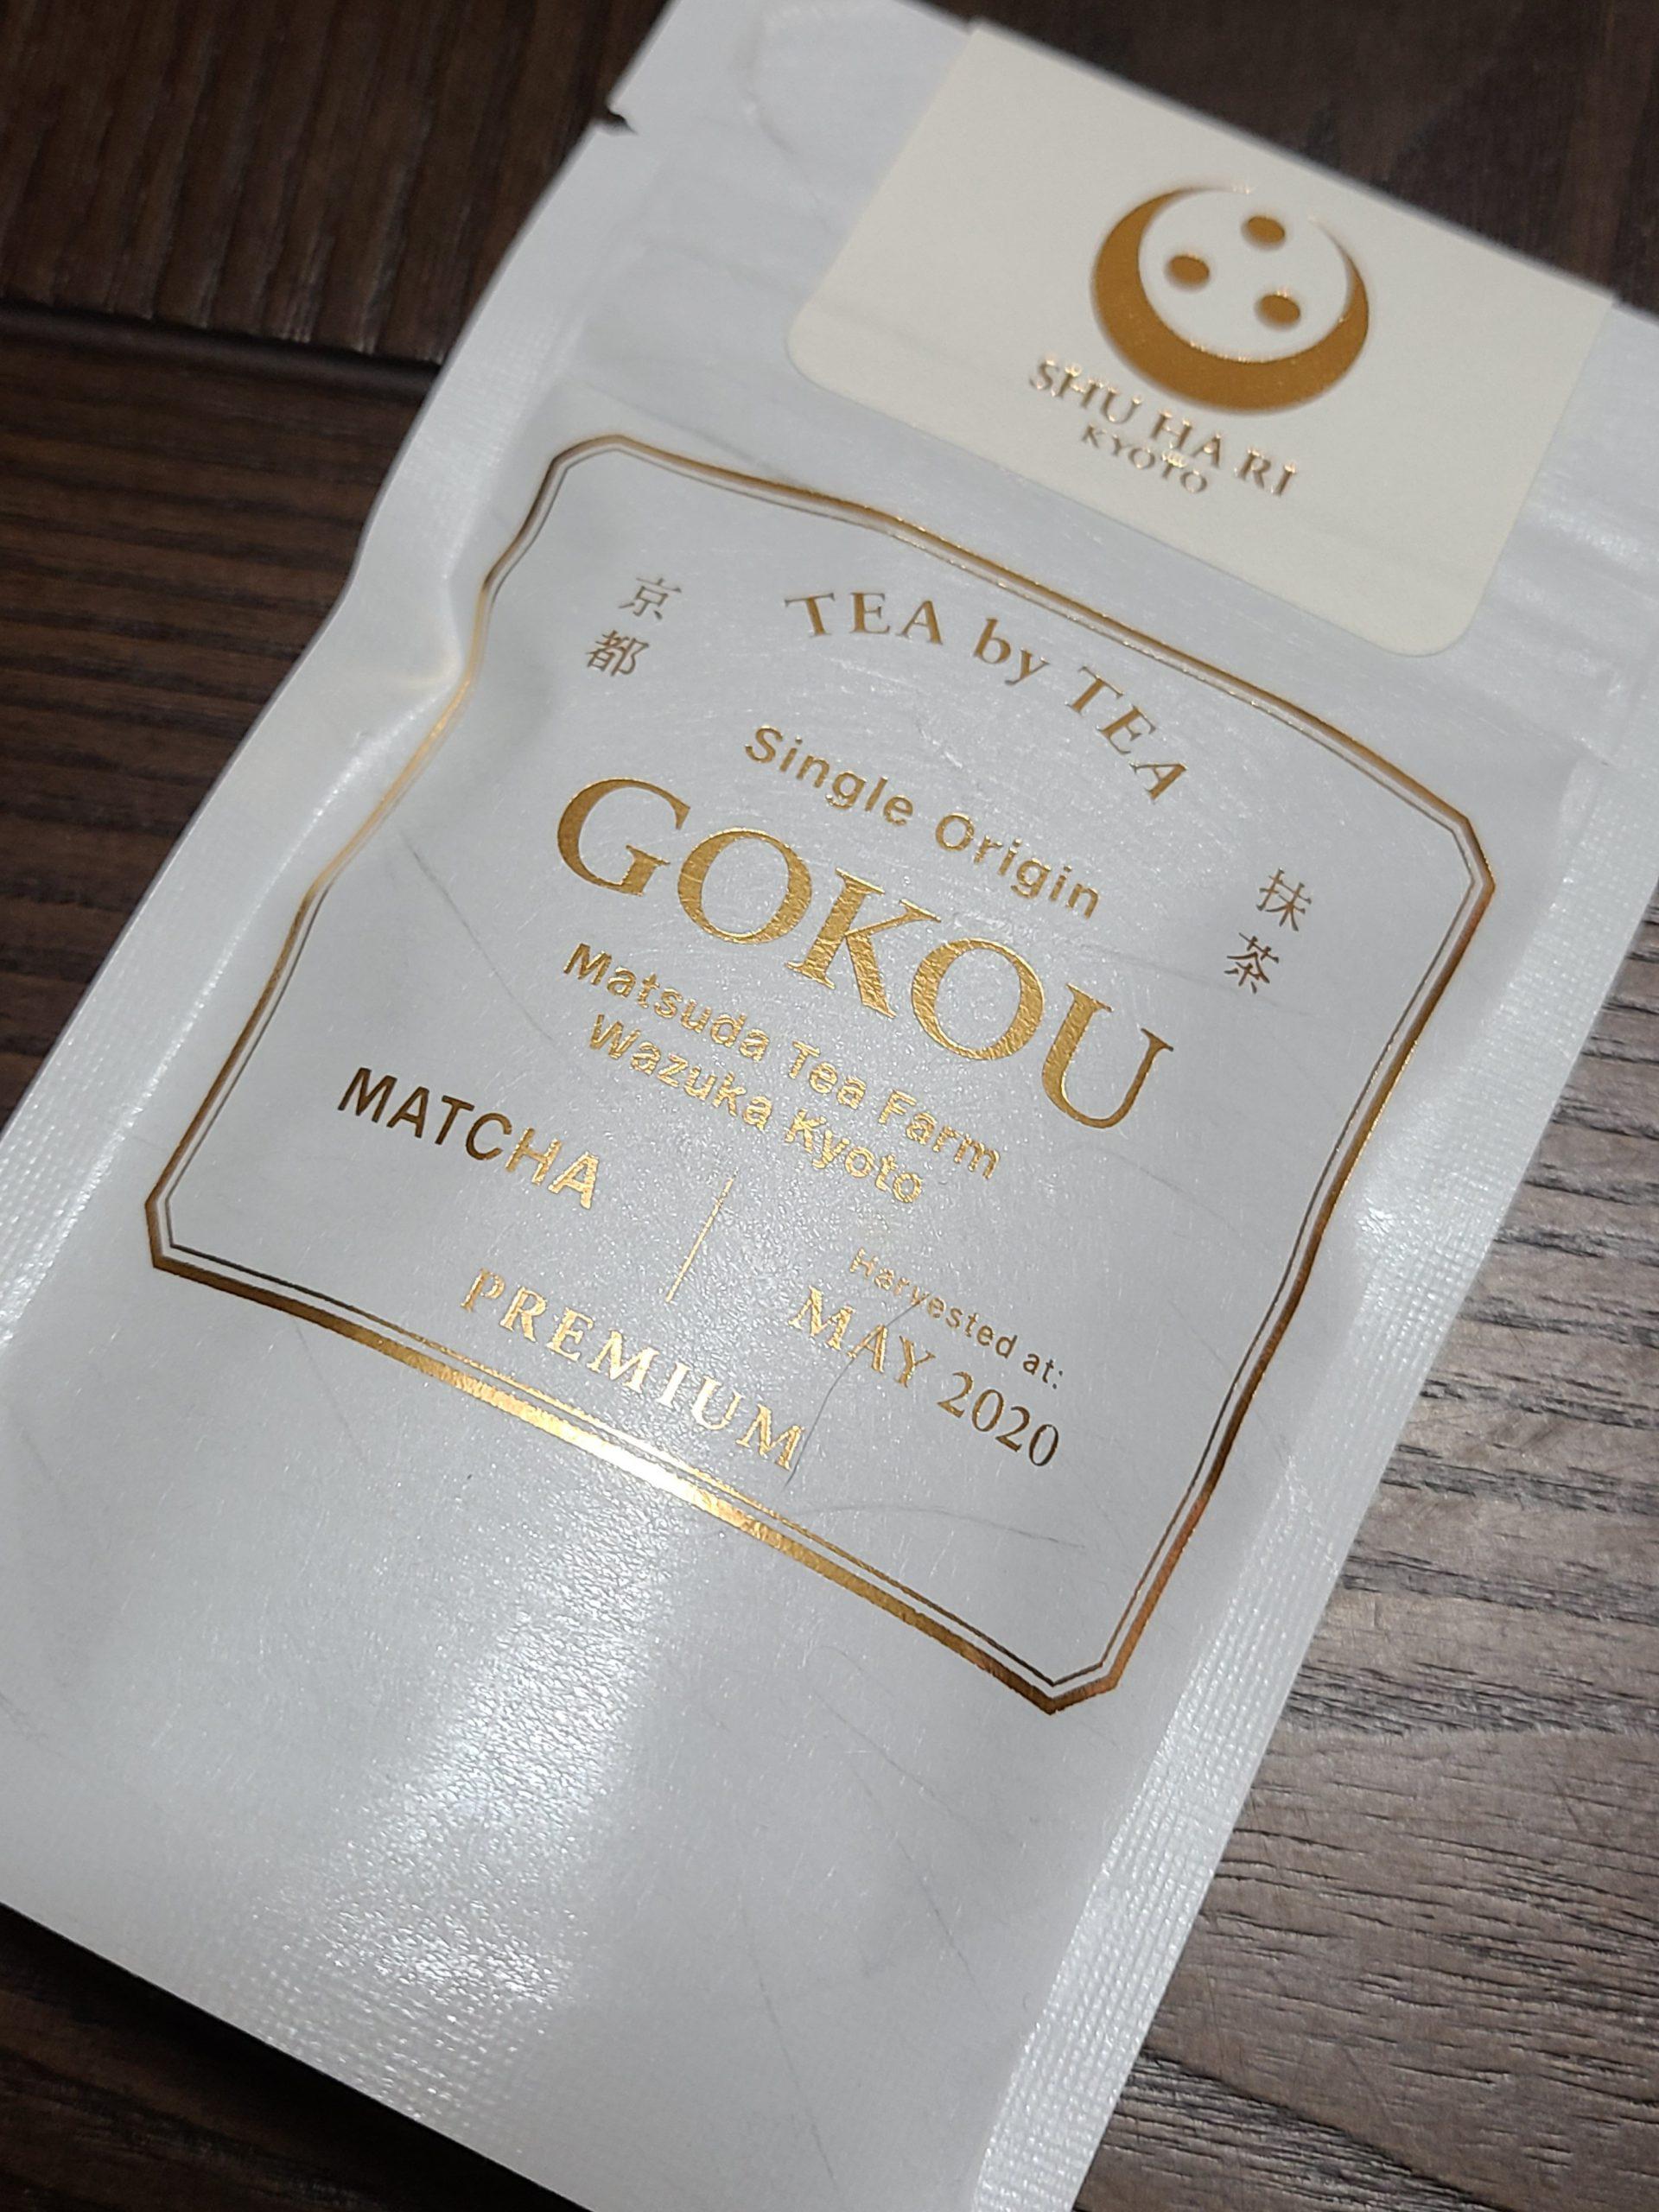 SHUHARI KYOTO「GOKOU」のレポート。珍しいシングル抹茶。ふつうのに飽きちゃった人におすすめ。